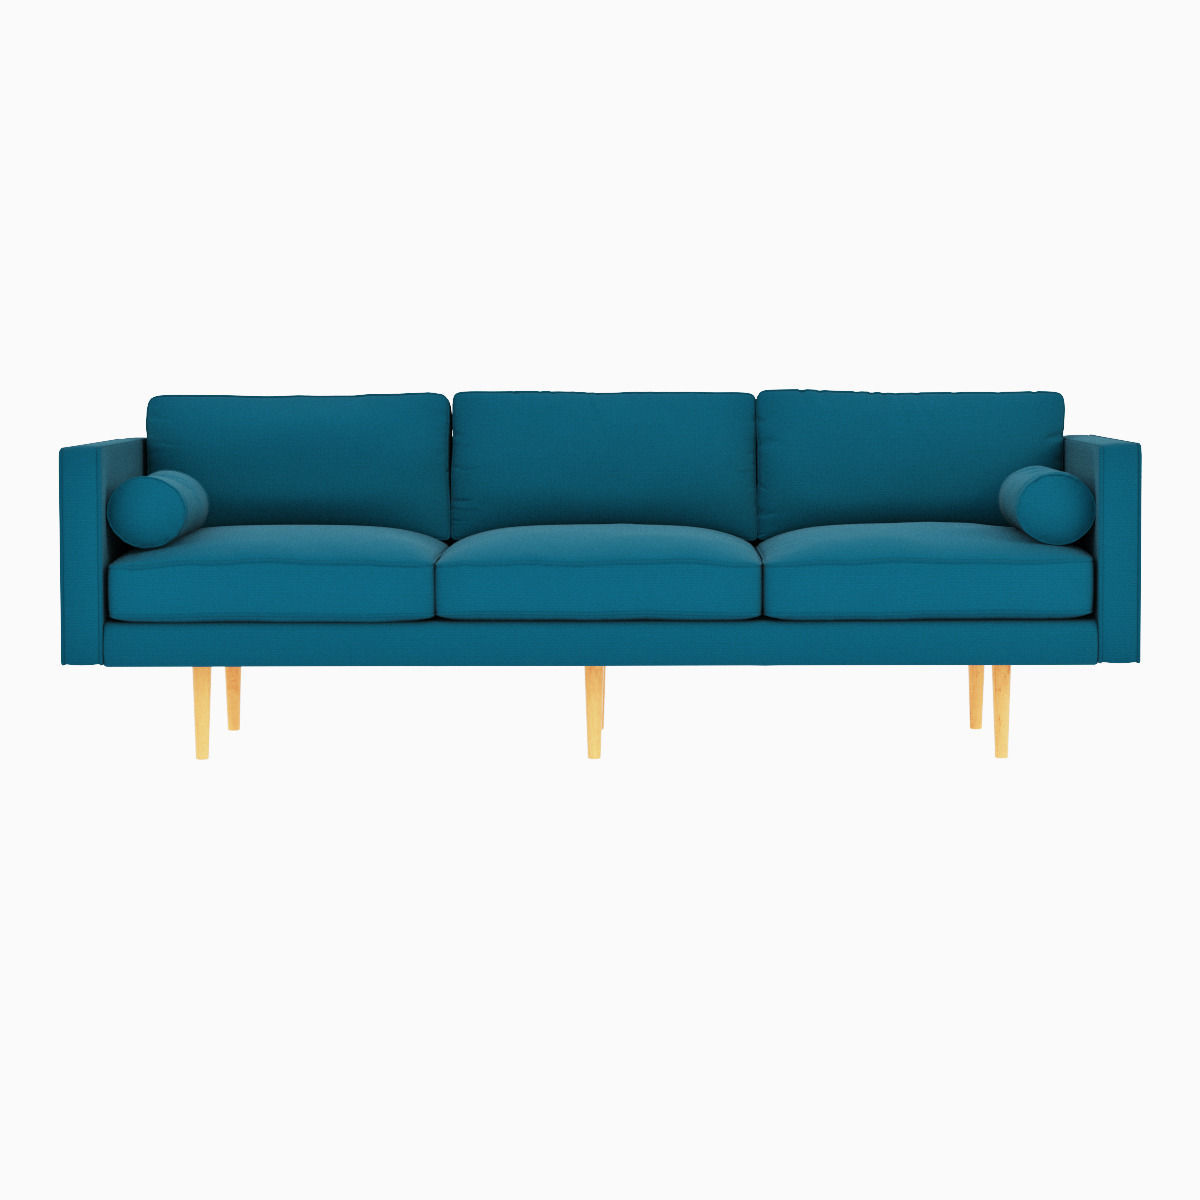 west elm monroe mid century sofa 3d model max obj fbx mtl. Black Bedroom Furniture Sets. Home Design Ideas